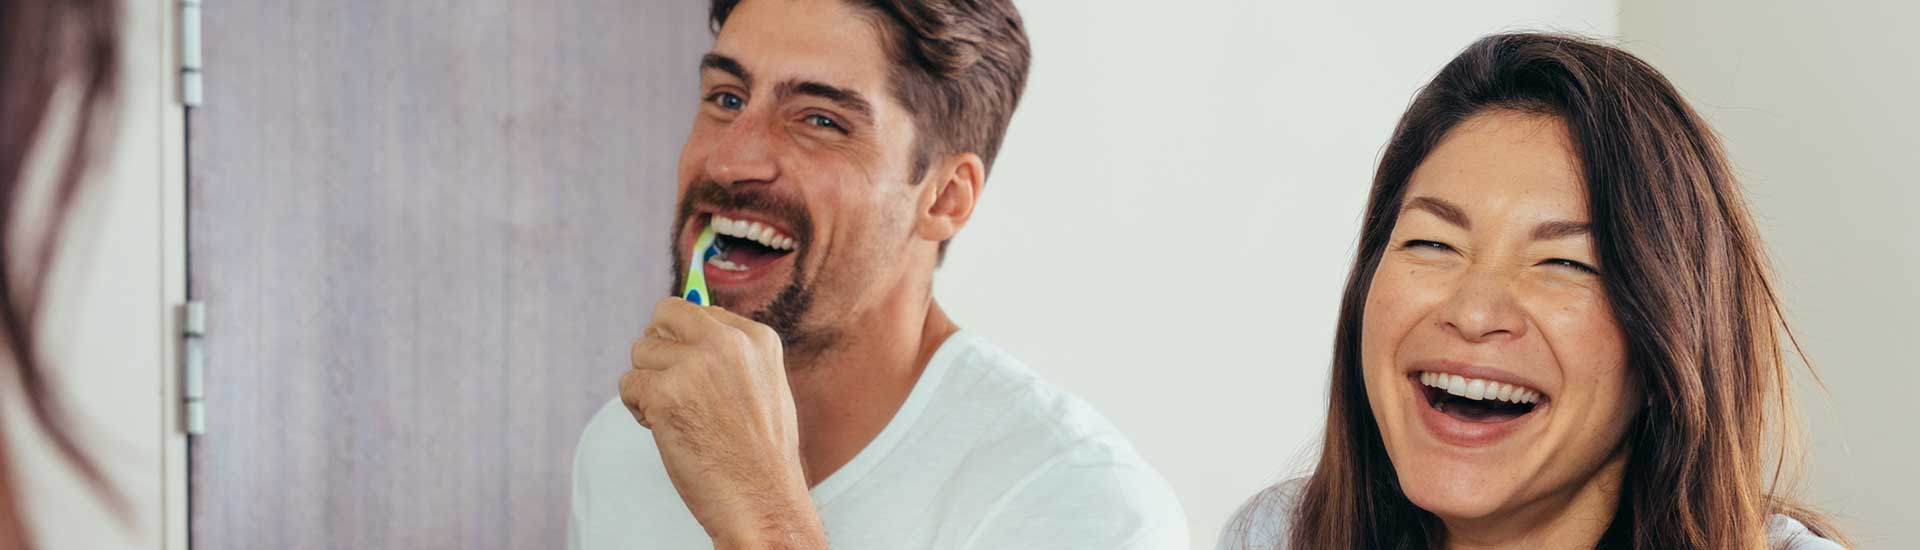 microcirugía periodontal